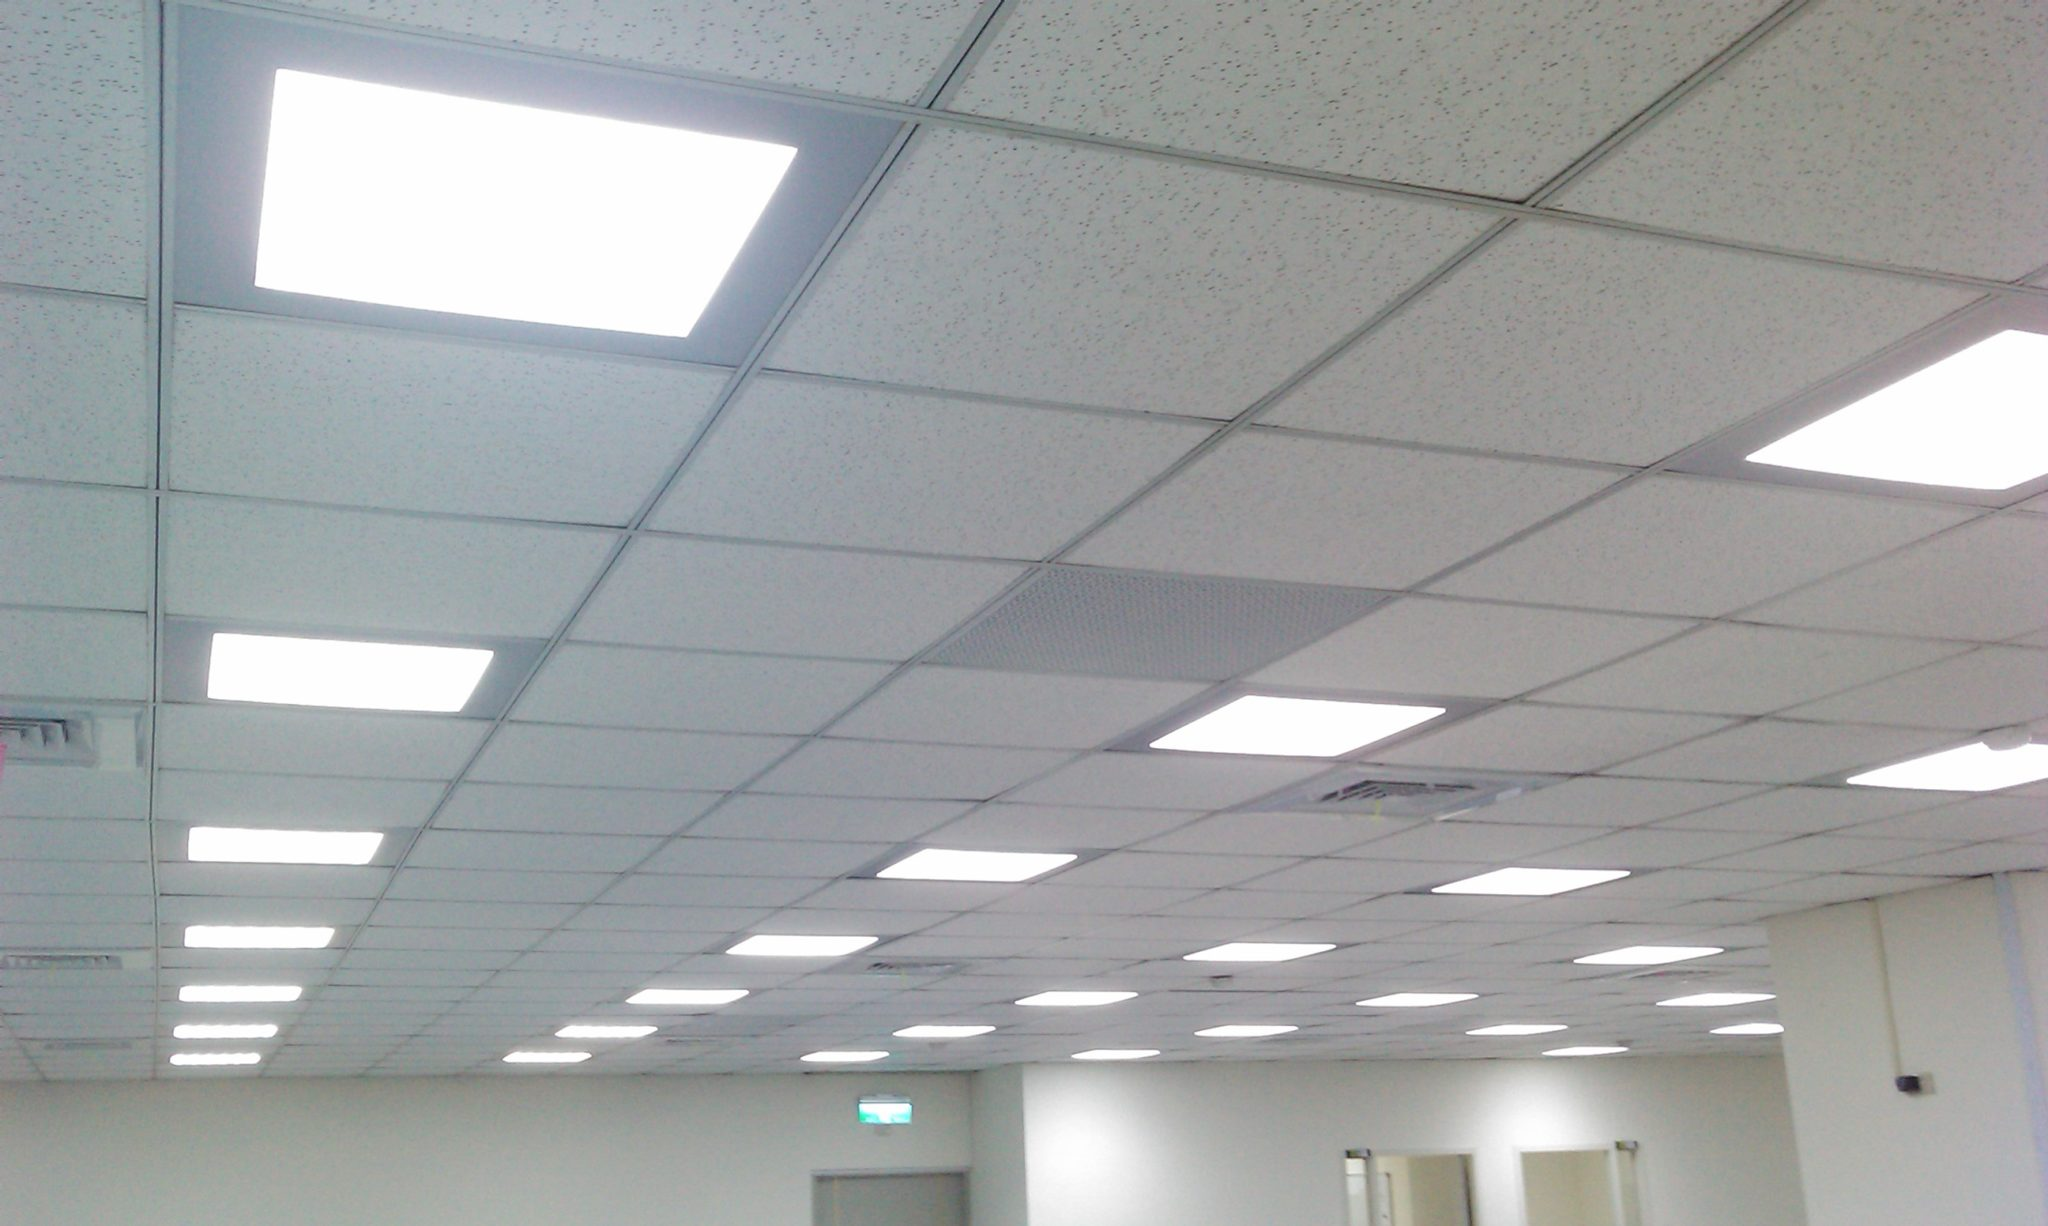 схема установки подвесного потолка из саидинга